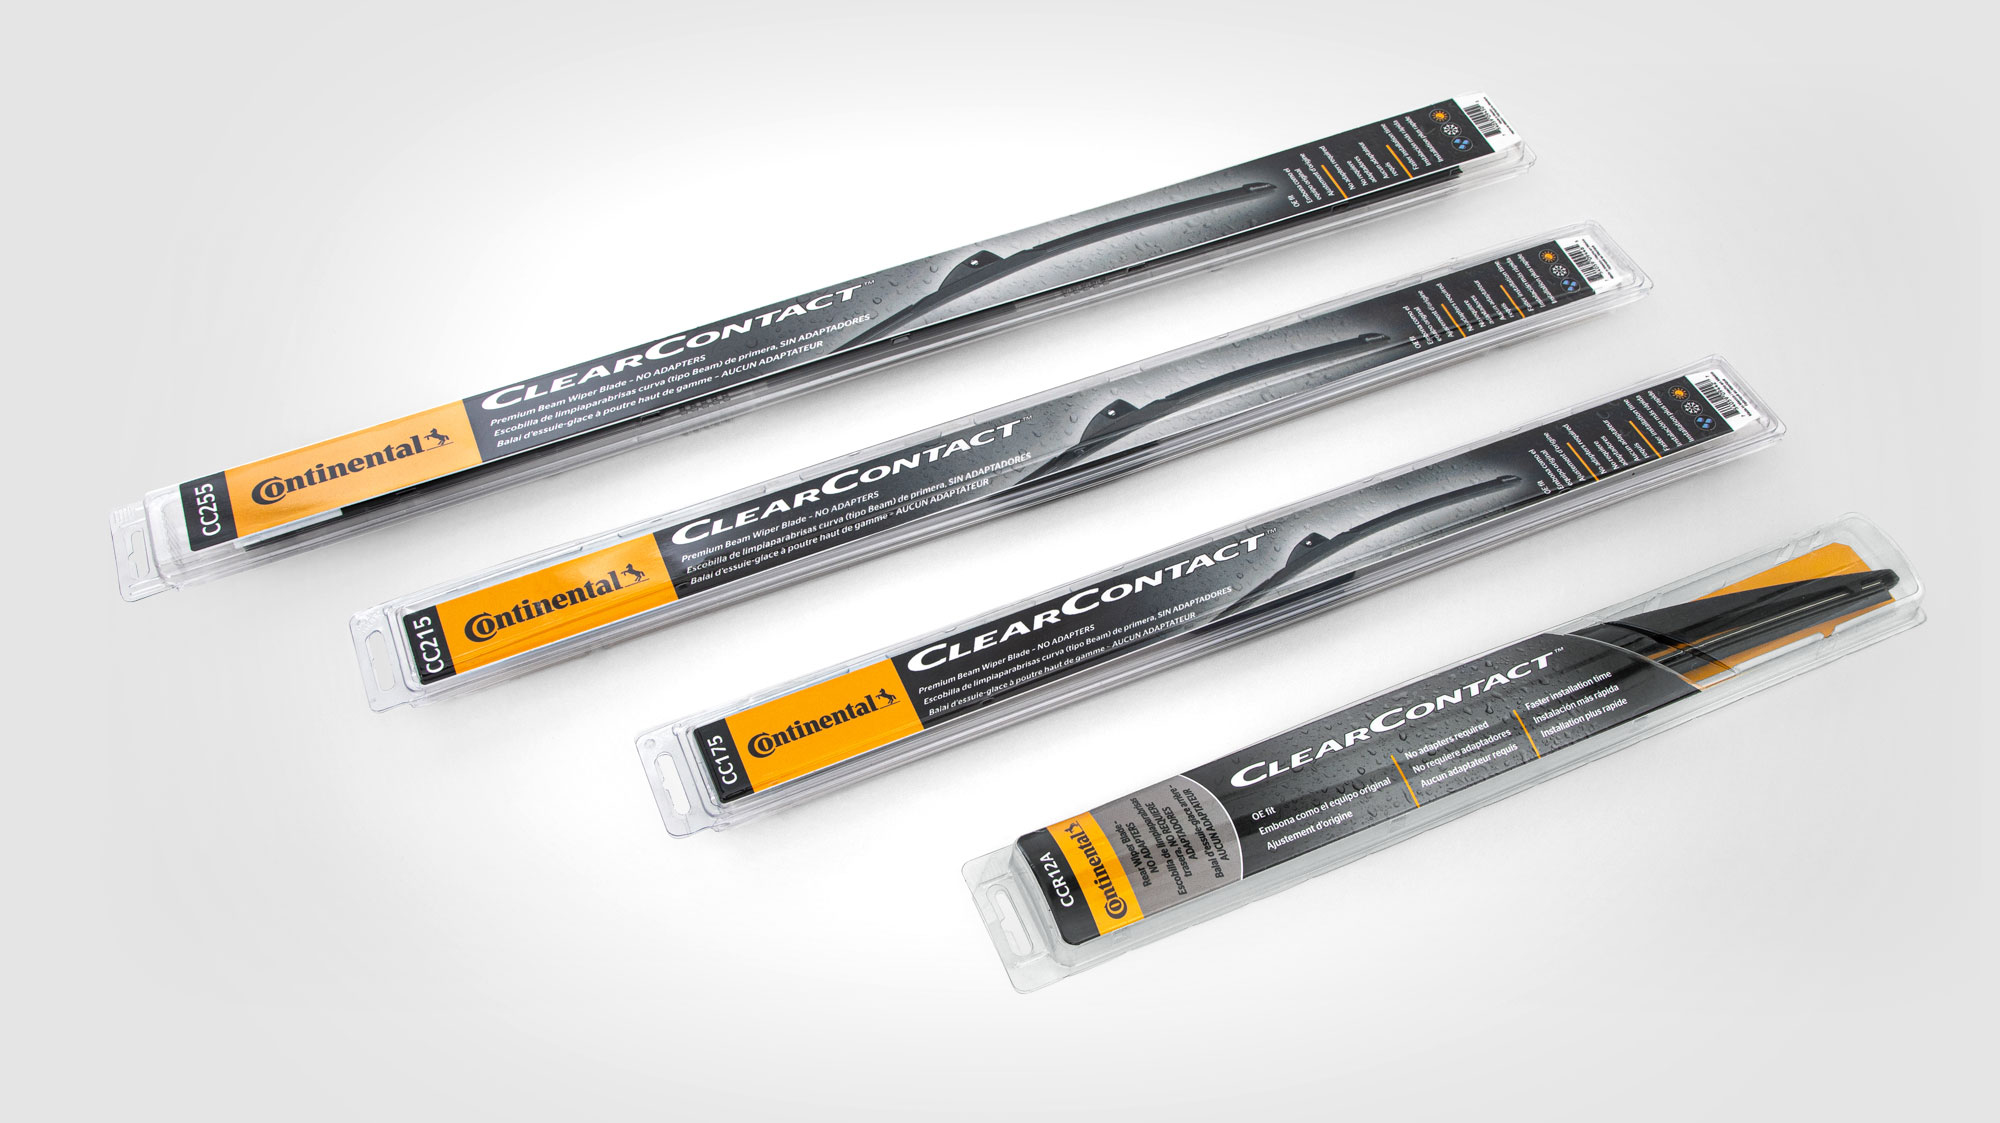 Continental Unveils ClearContact Premium Beam Wiper Blades